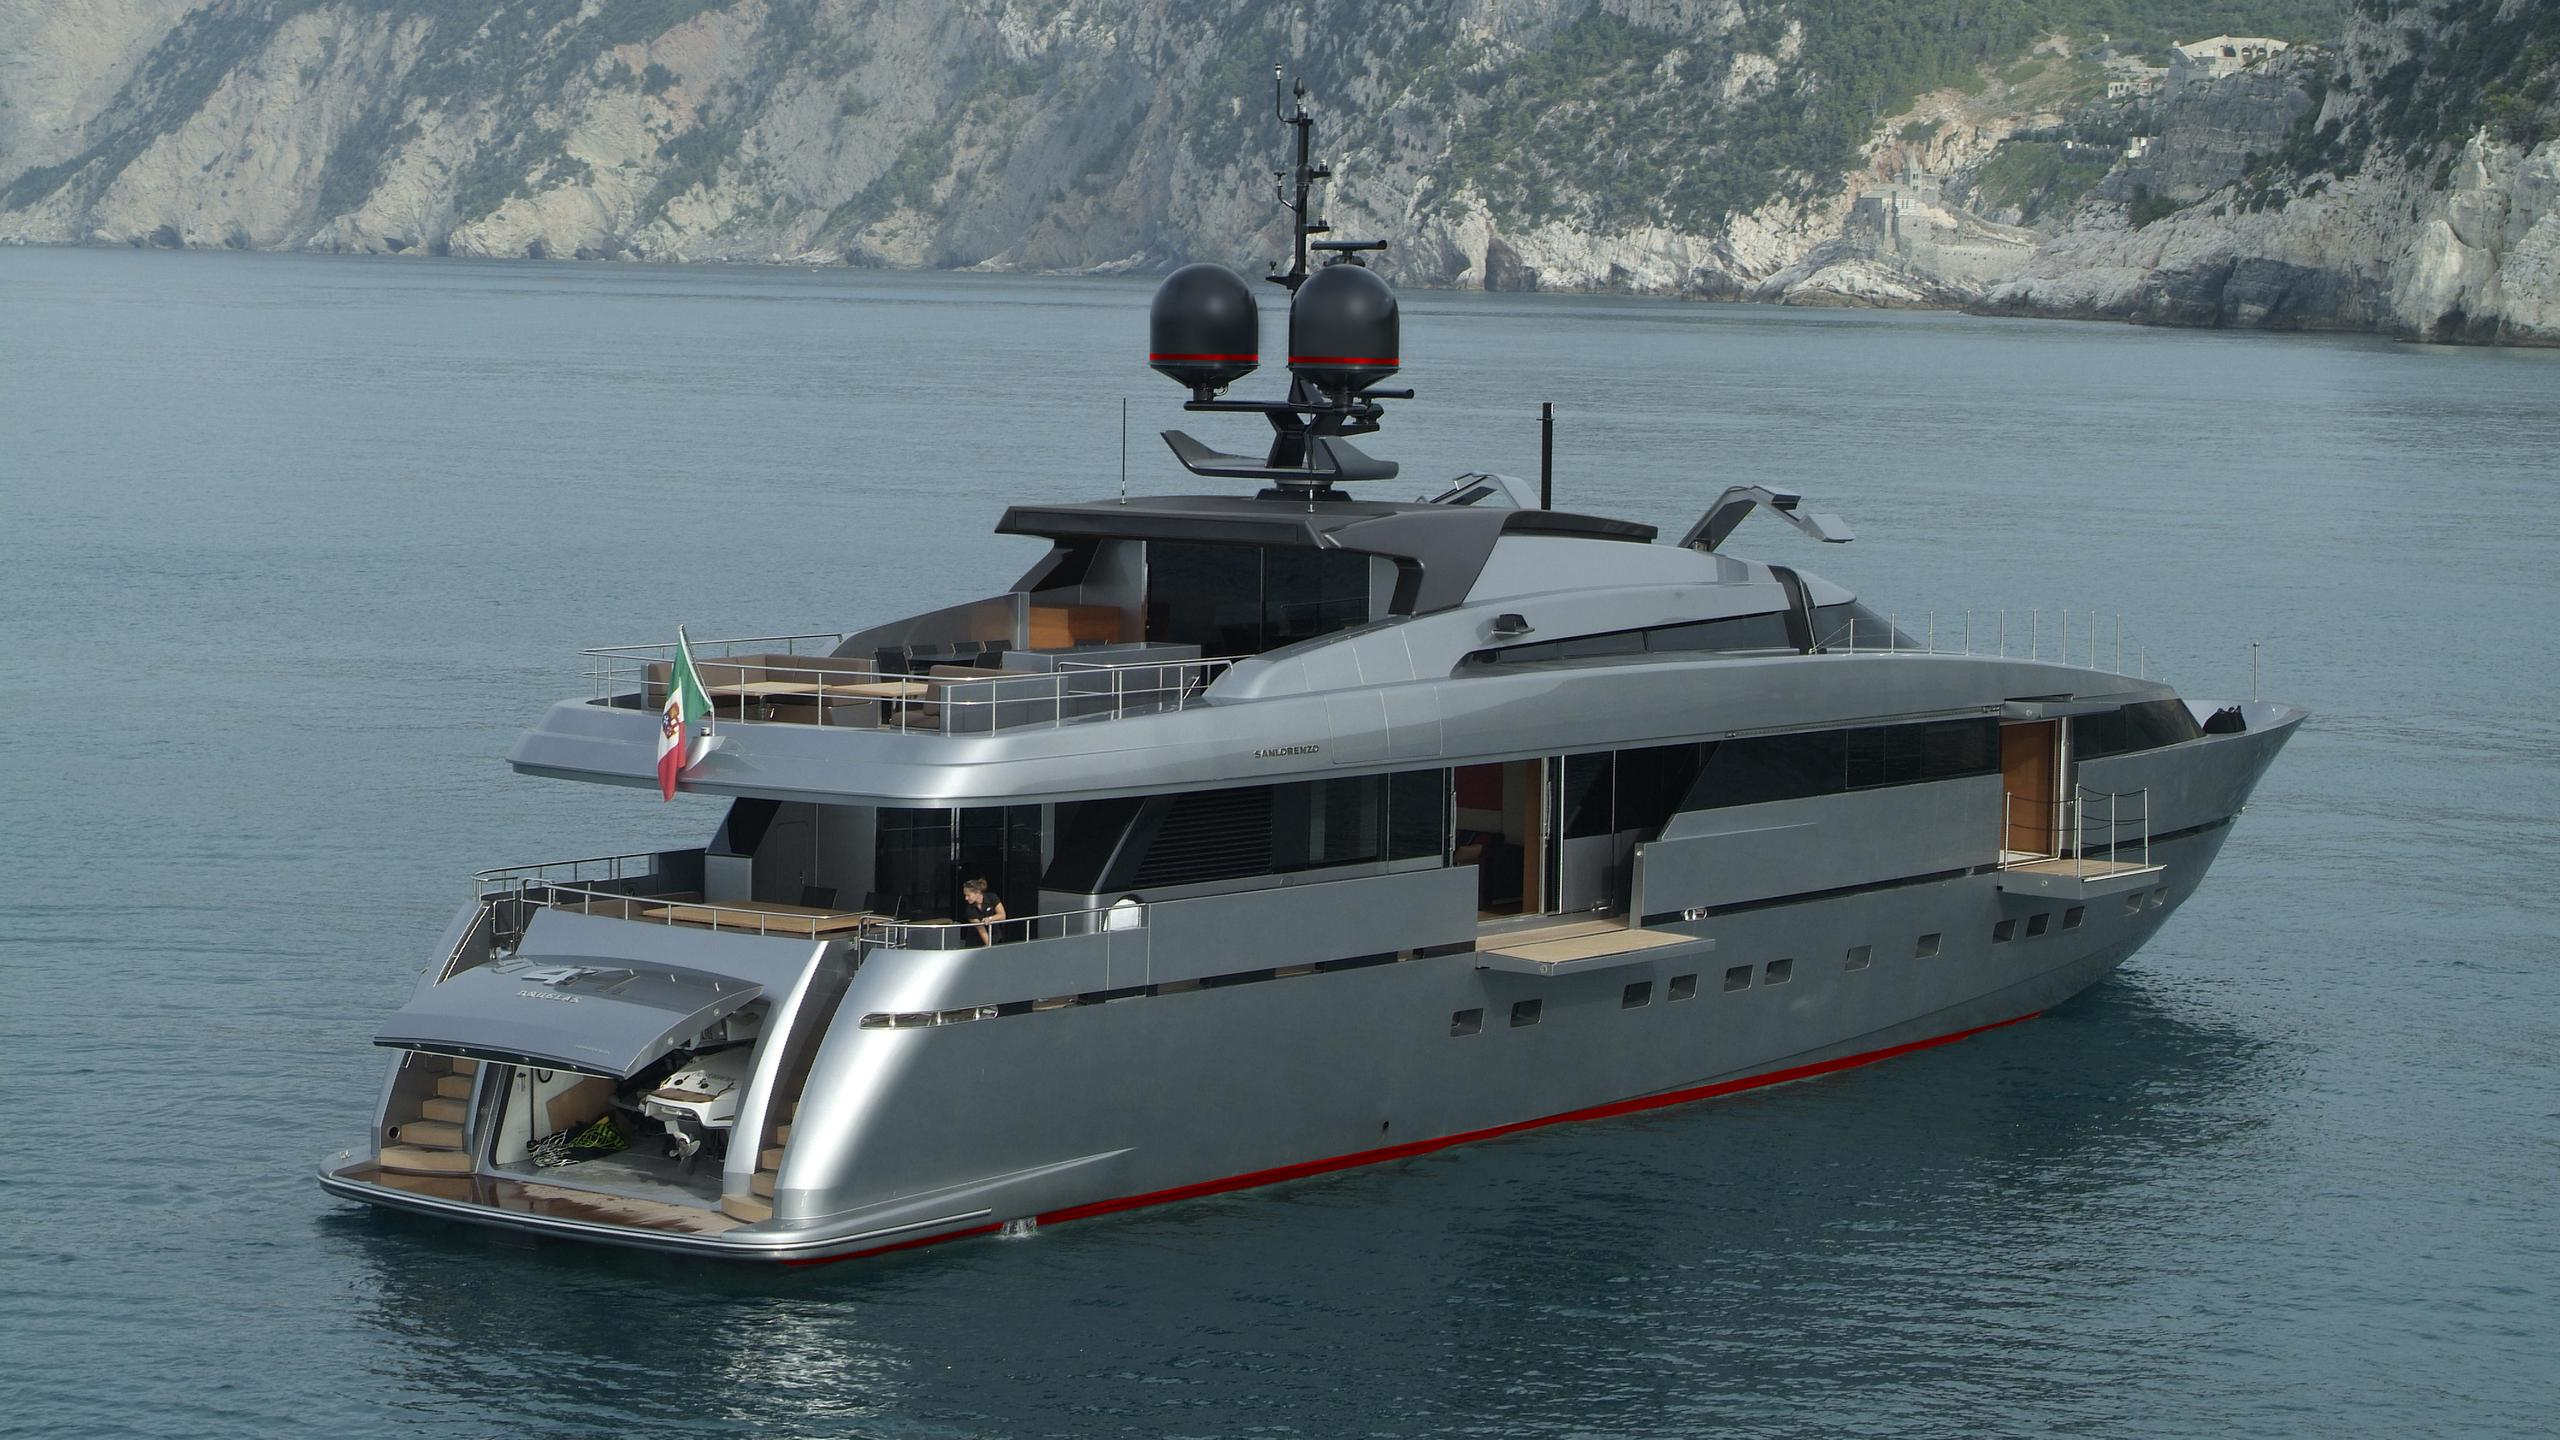 tesoro scorpion motoryacht sanlorenzo alloy 40m 2011 half stern